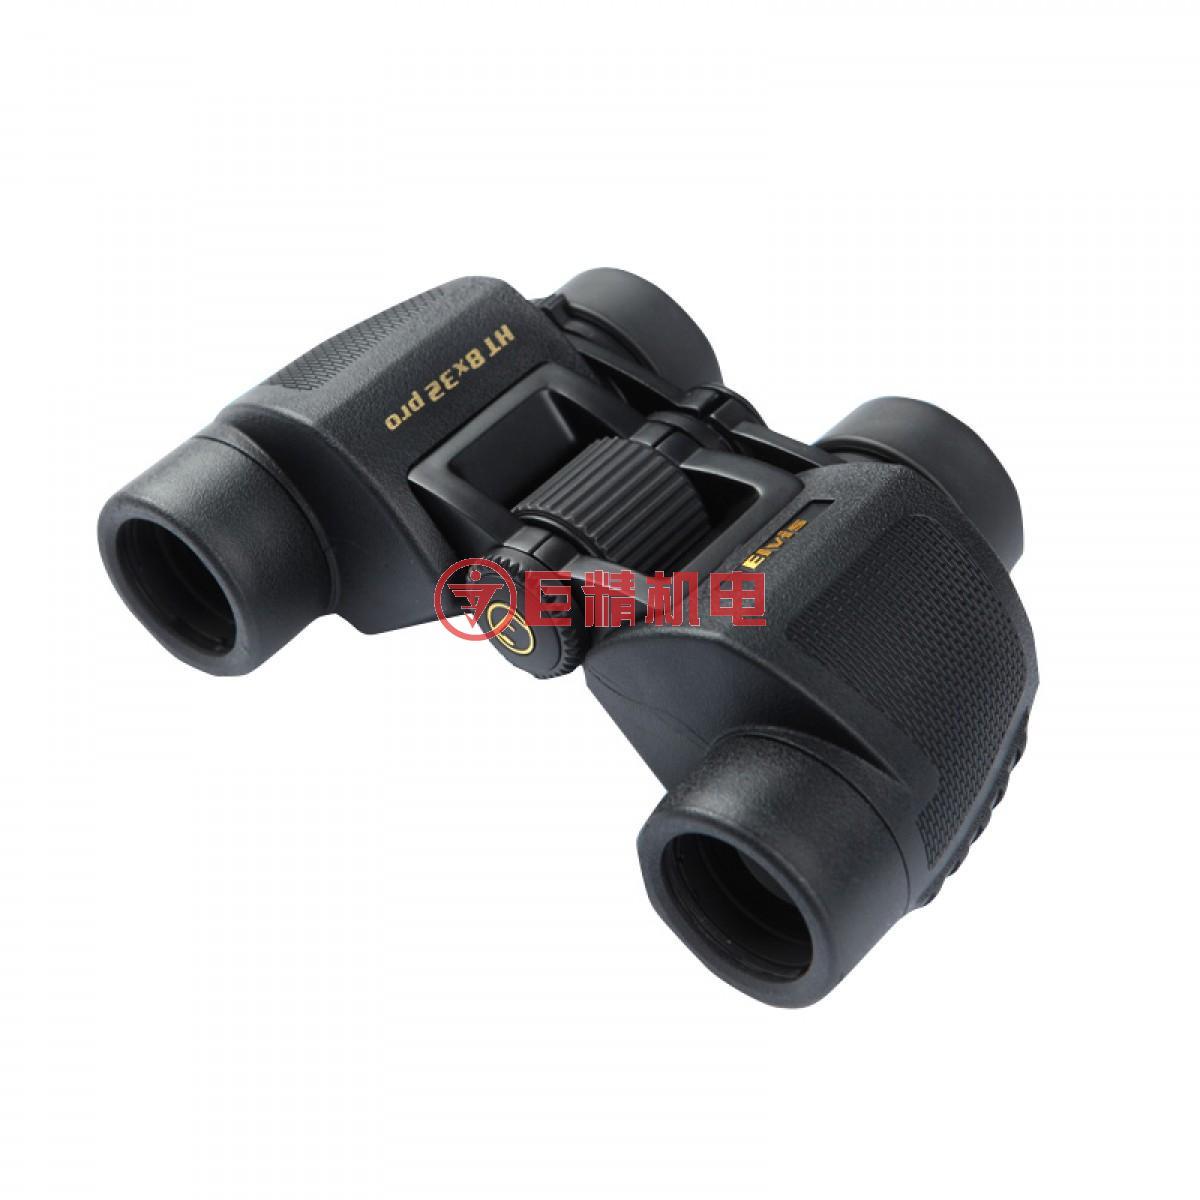 Elvis艾立仕HT10X42pro防水防雾保罗双筒望远镜 生态镜片 宽视场